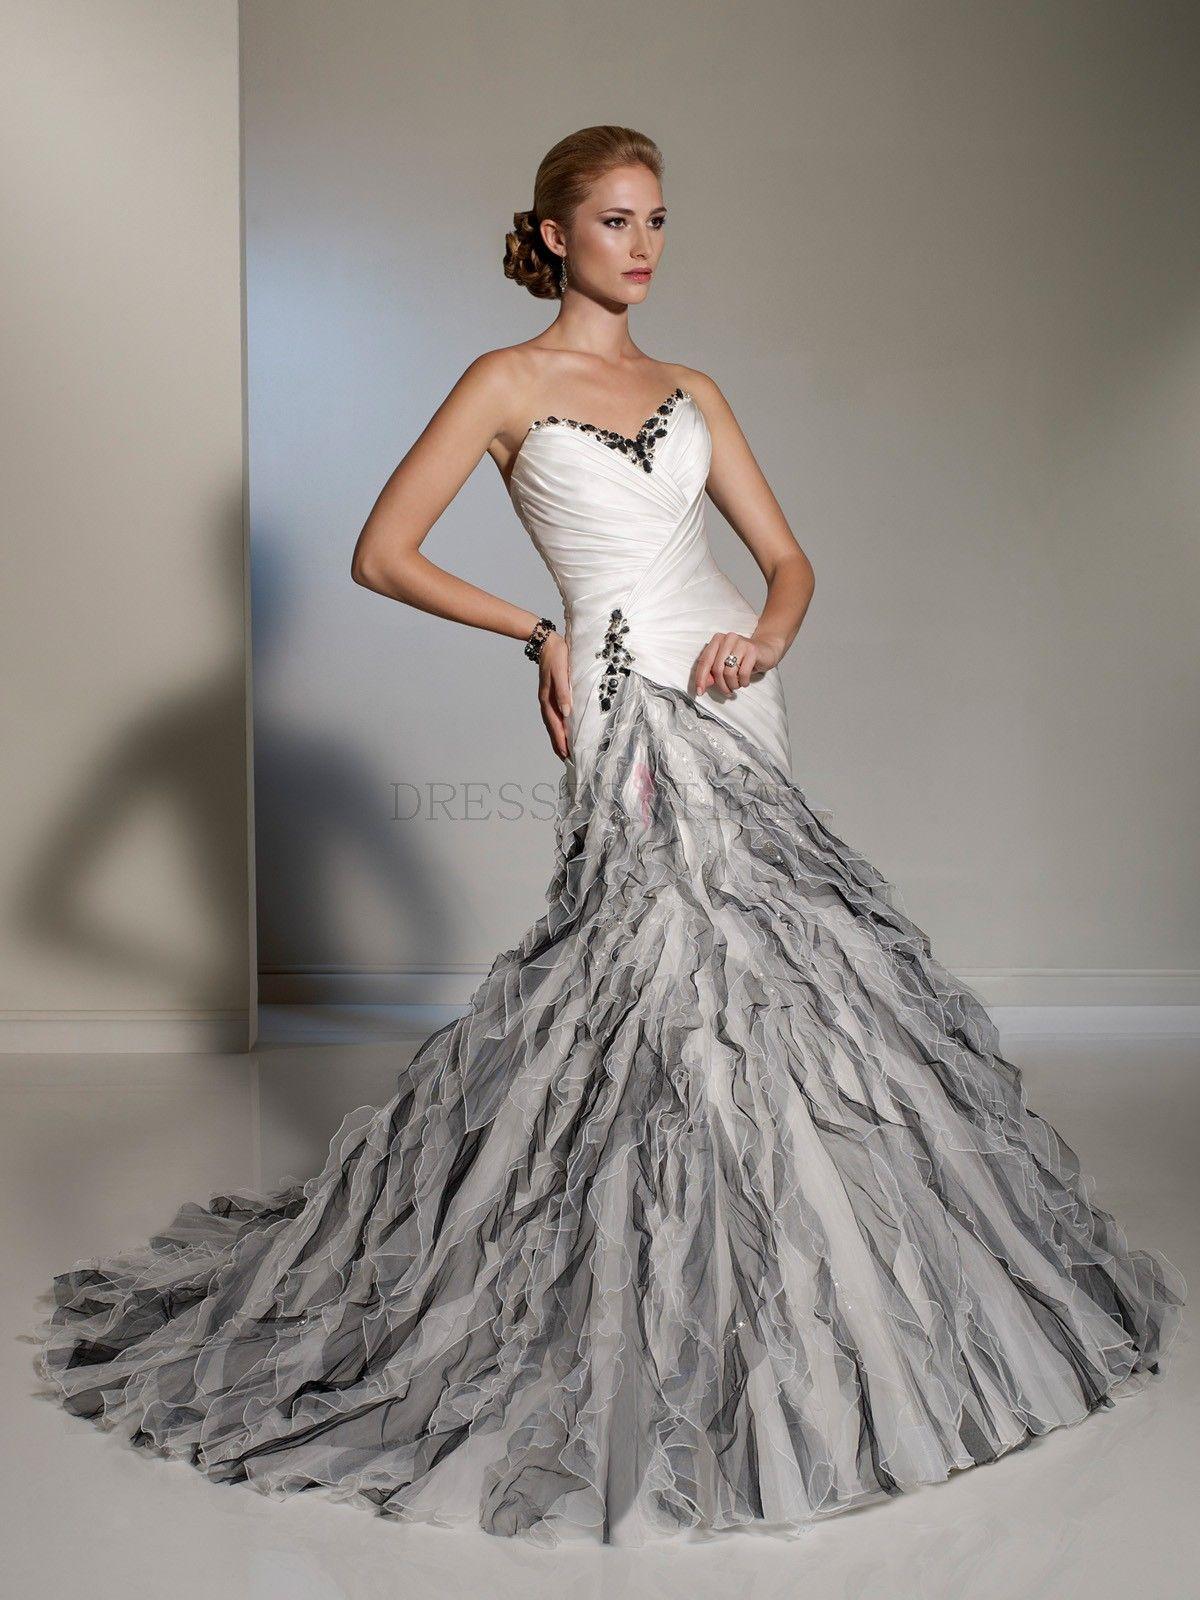 Lace Wedding Dresses Dress: Black Ruffled Wedding Dresses At Websimilar.org